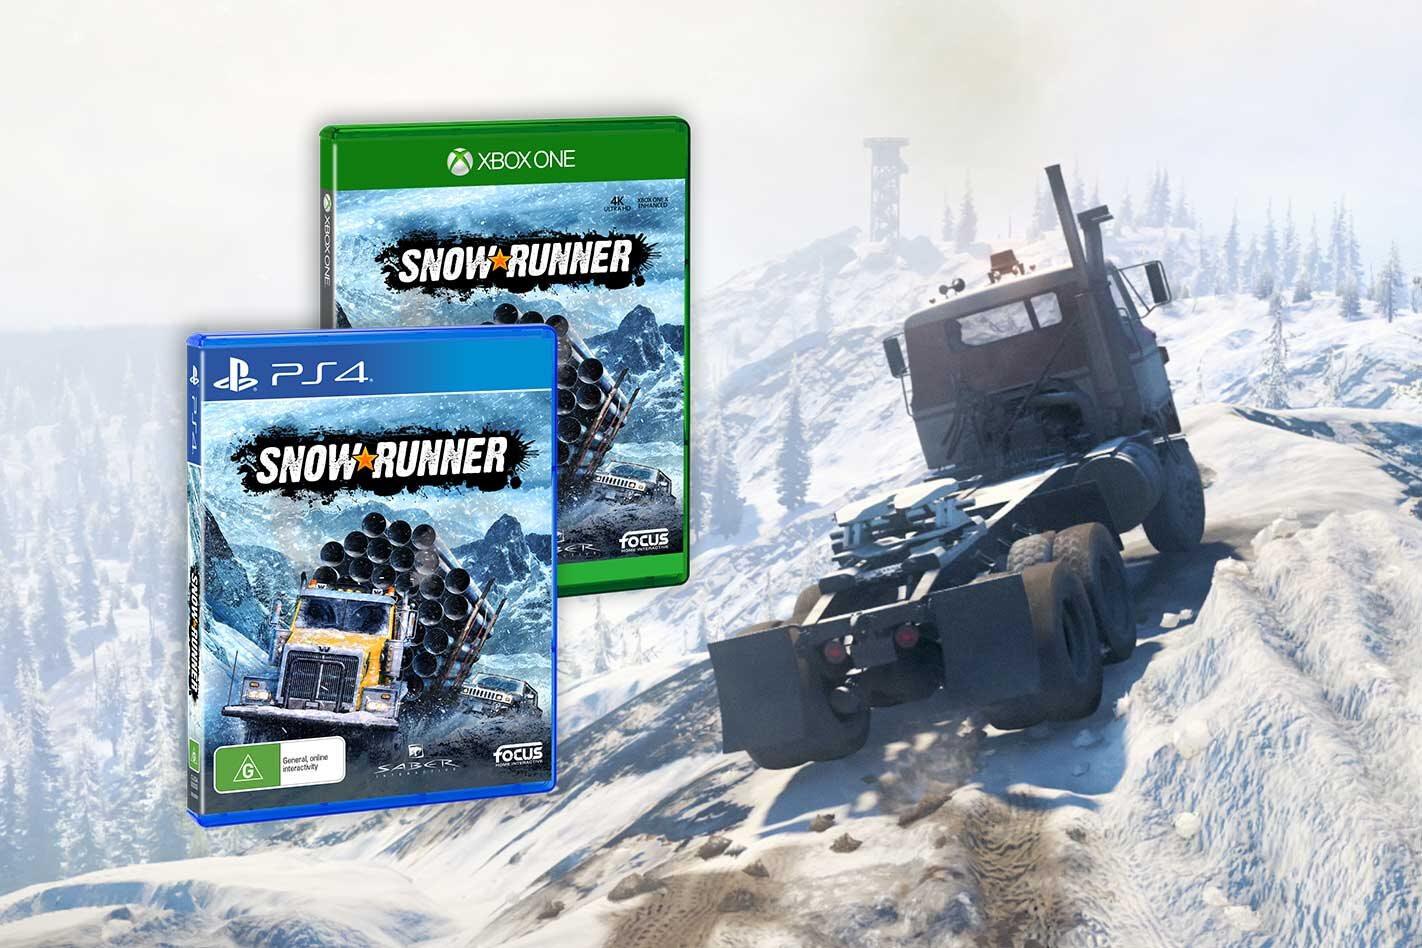 SnowRunner release date details